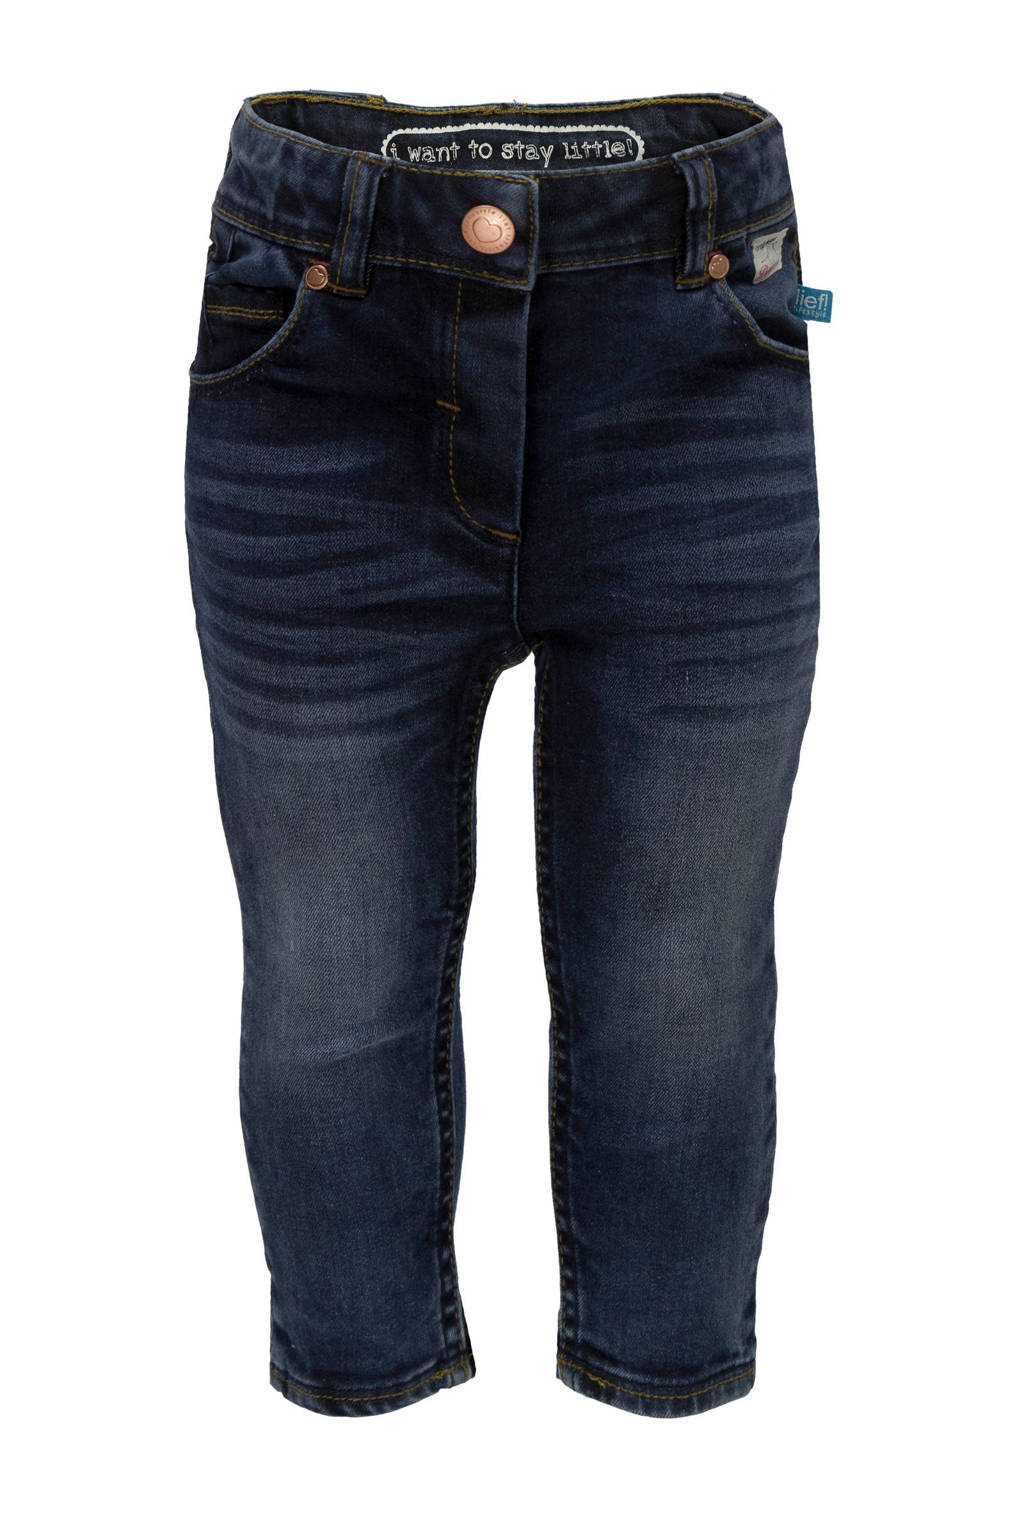 lief! skinny jeans, Dark denim